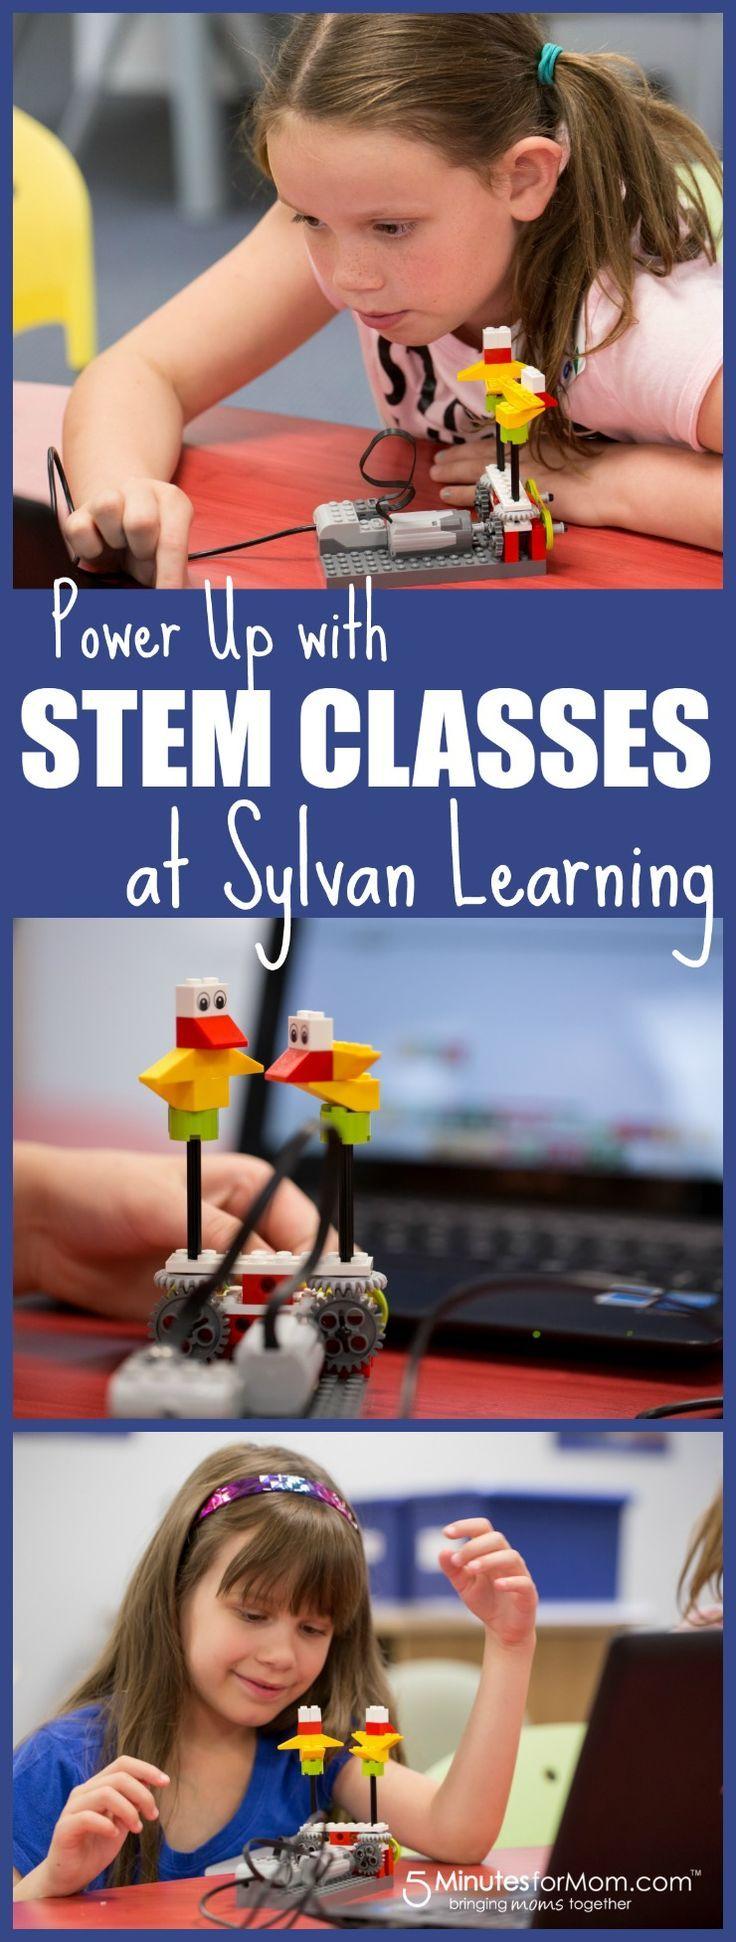 Sylvan EDGE classes teach STEM concepts using fun technology. We tested out the kids Robotics class.